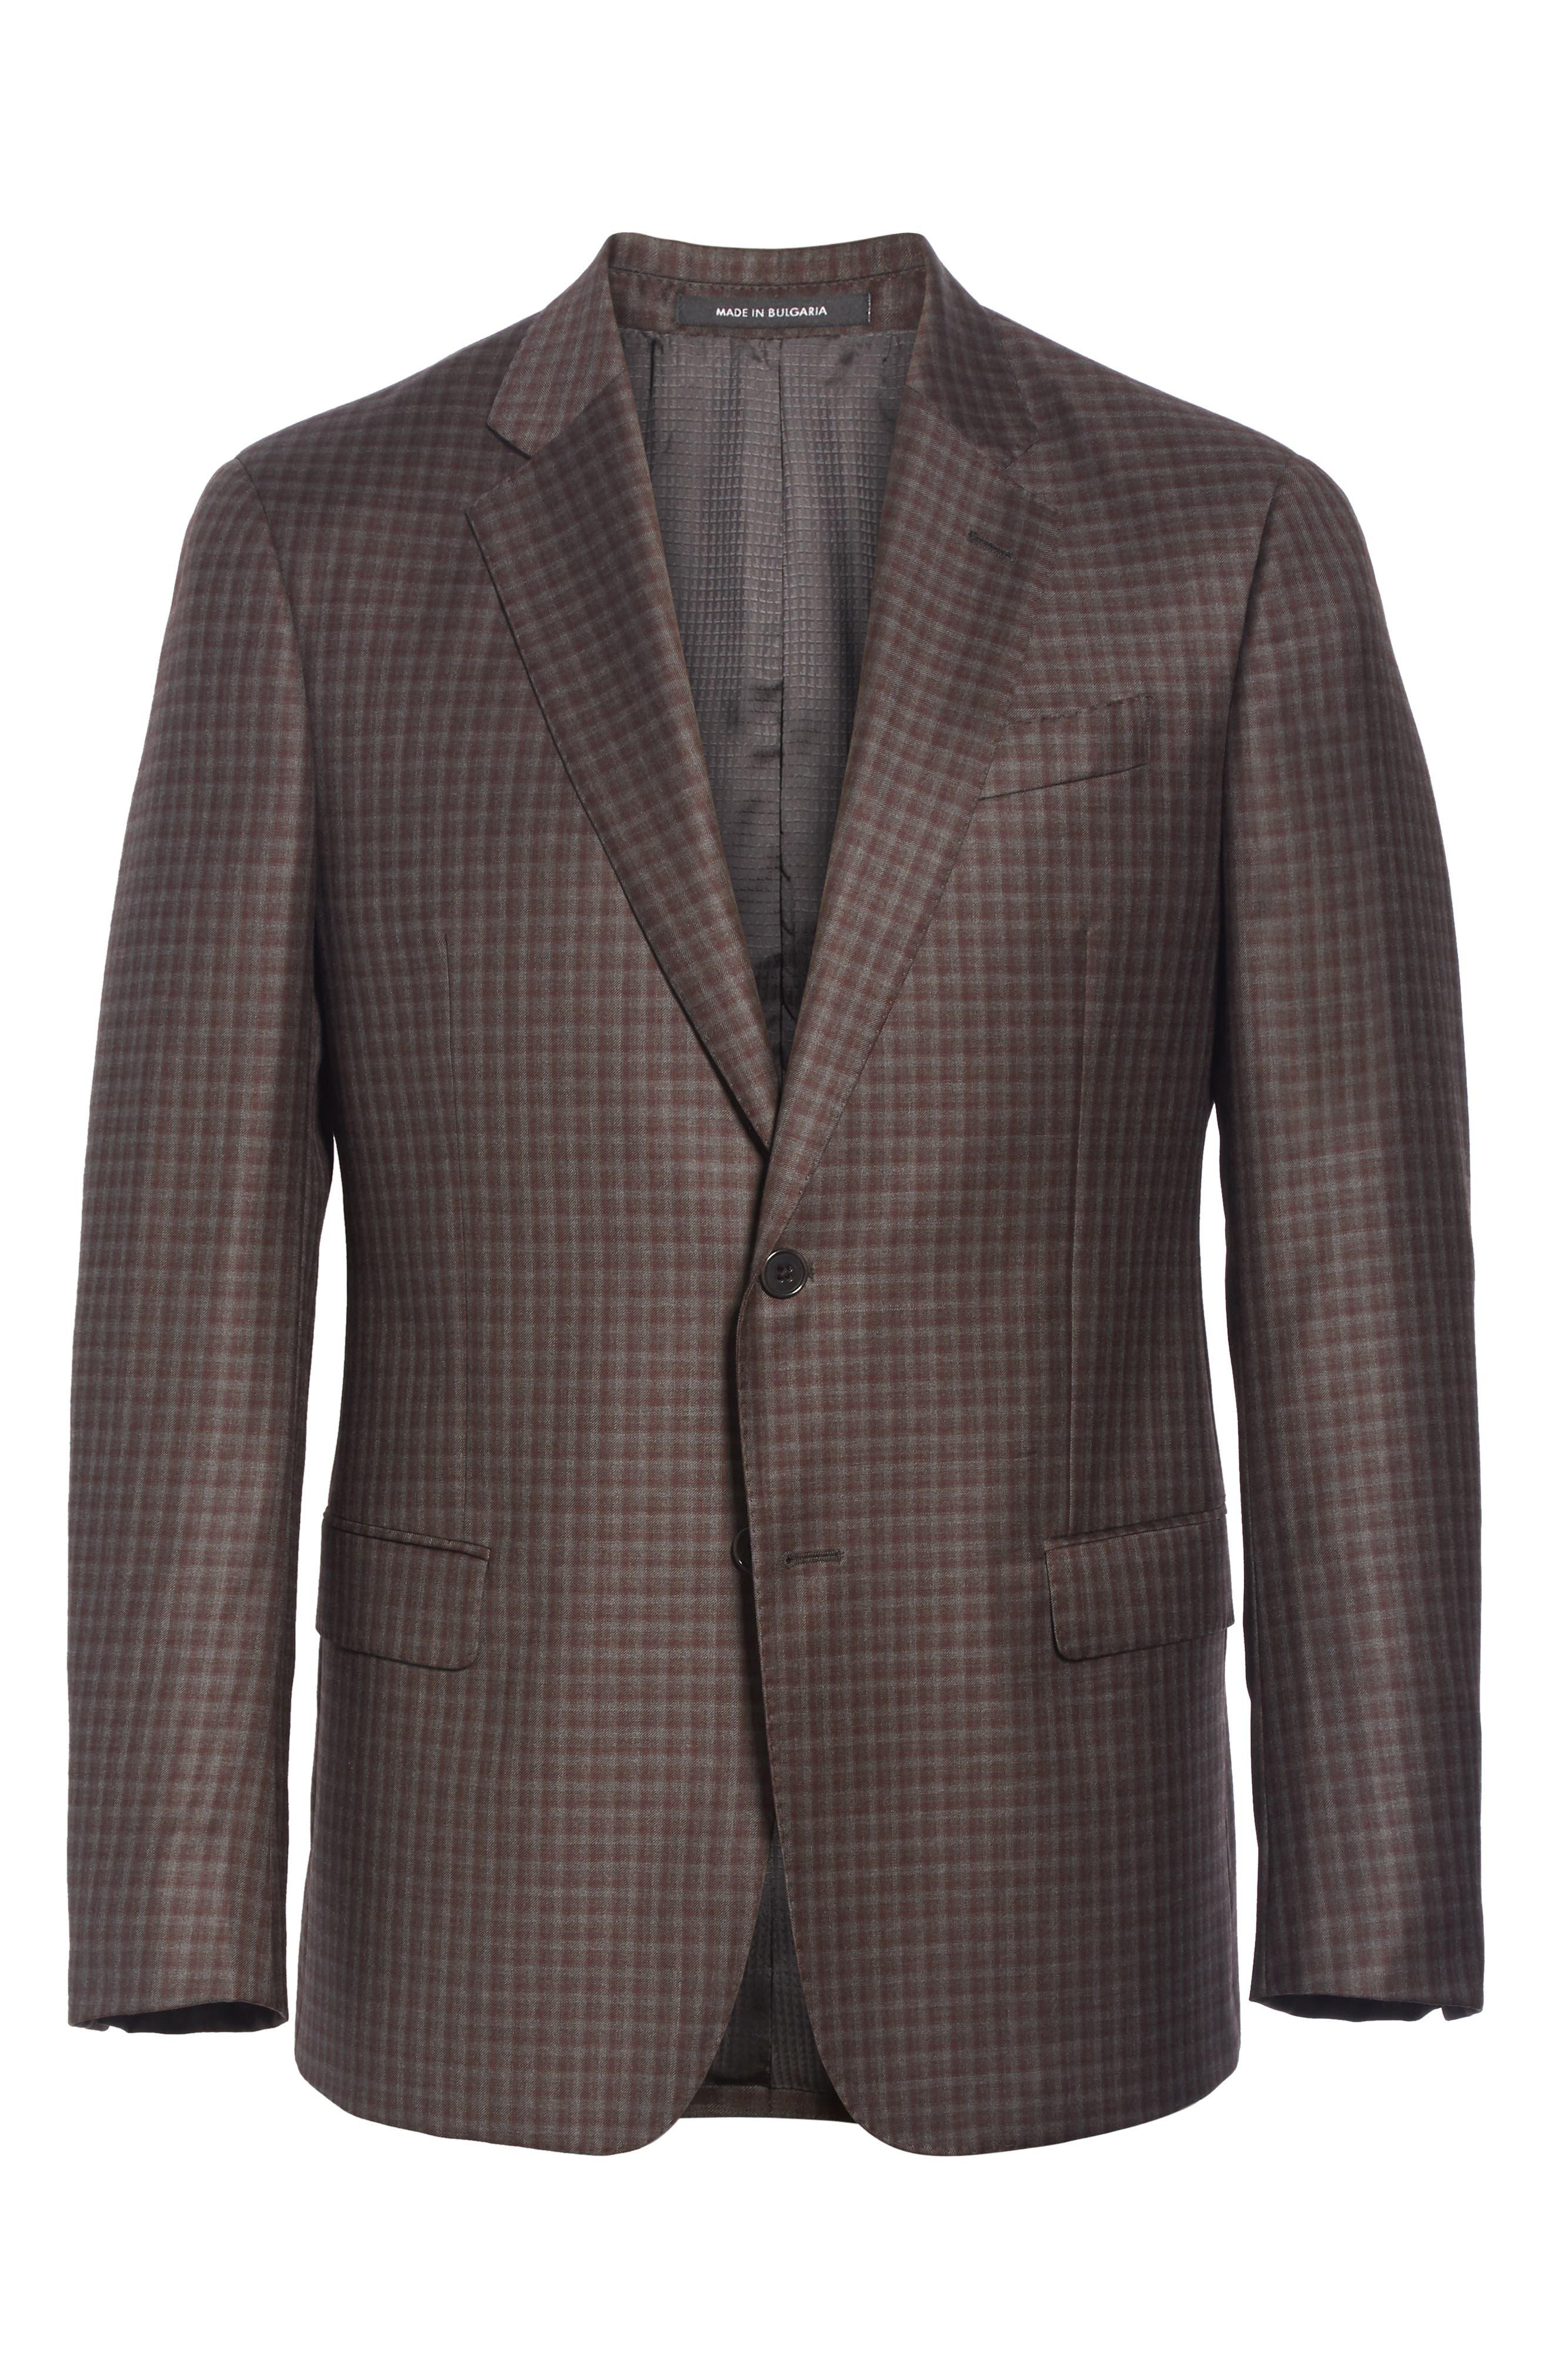 G-Line Trim Fit Plaid Wool Sport Coat,                             Alternate thumbnail 5, color,                             RED/ BROWN